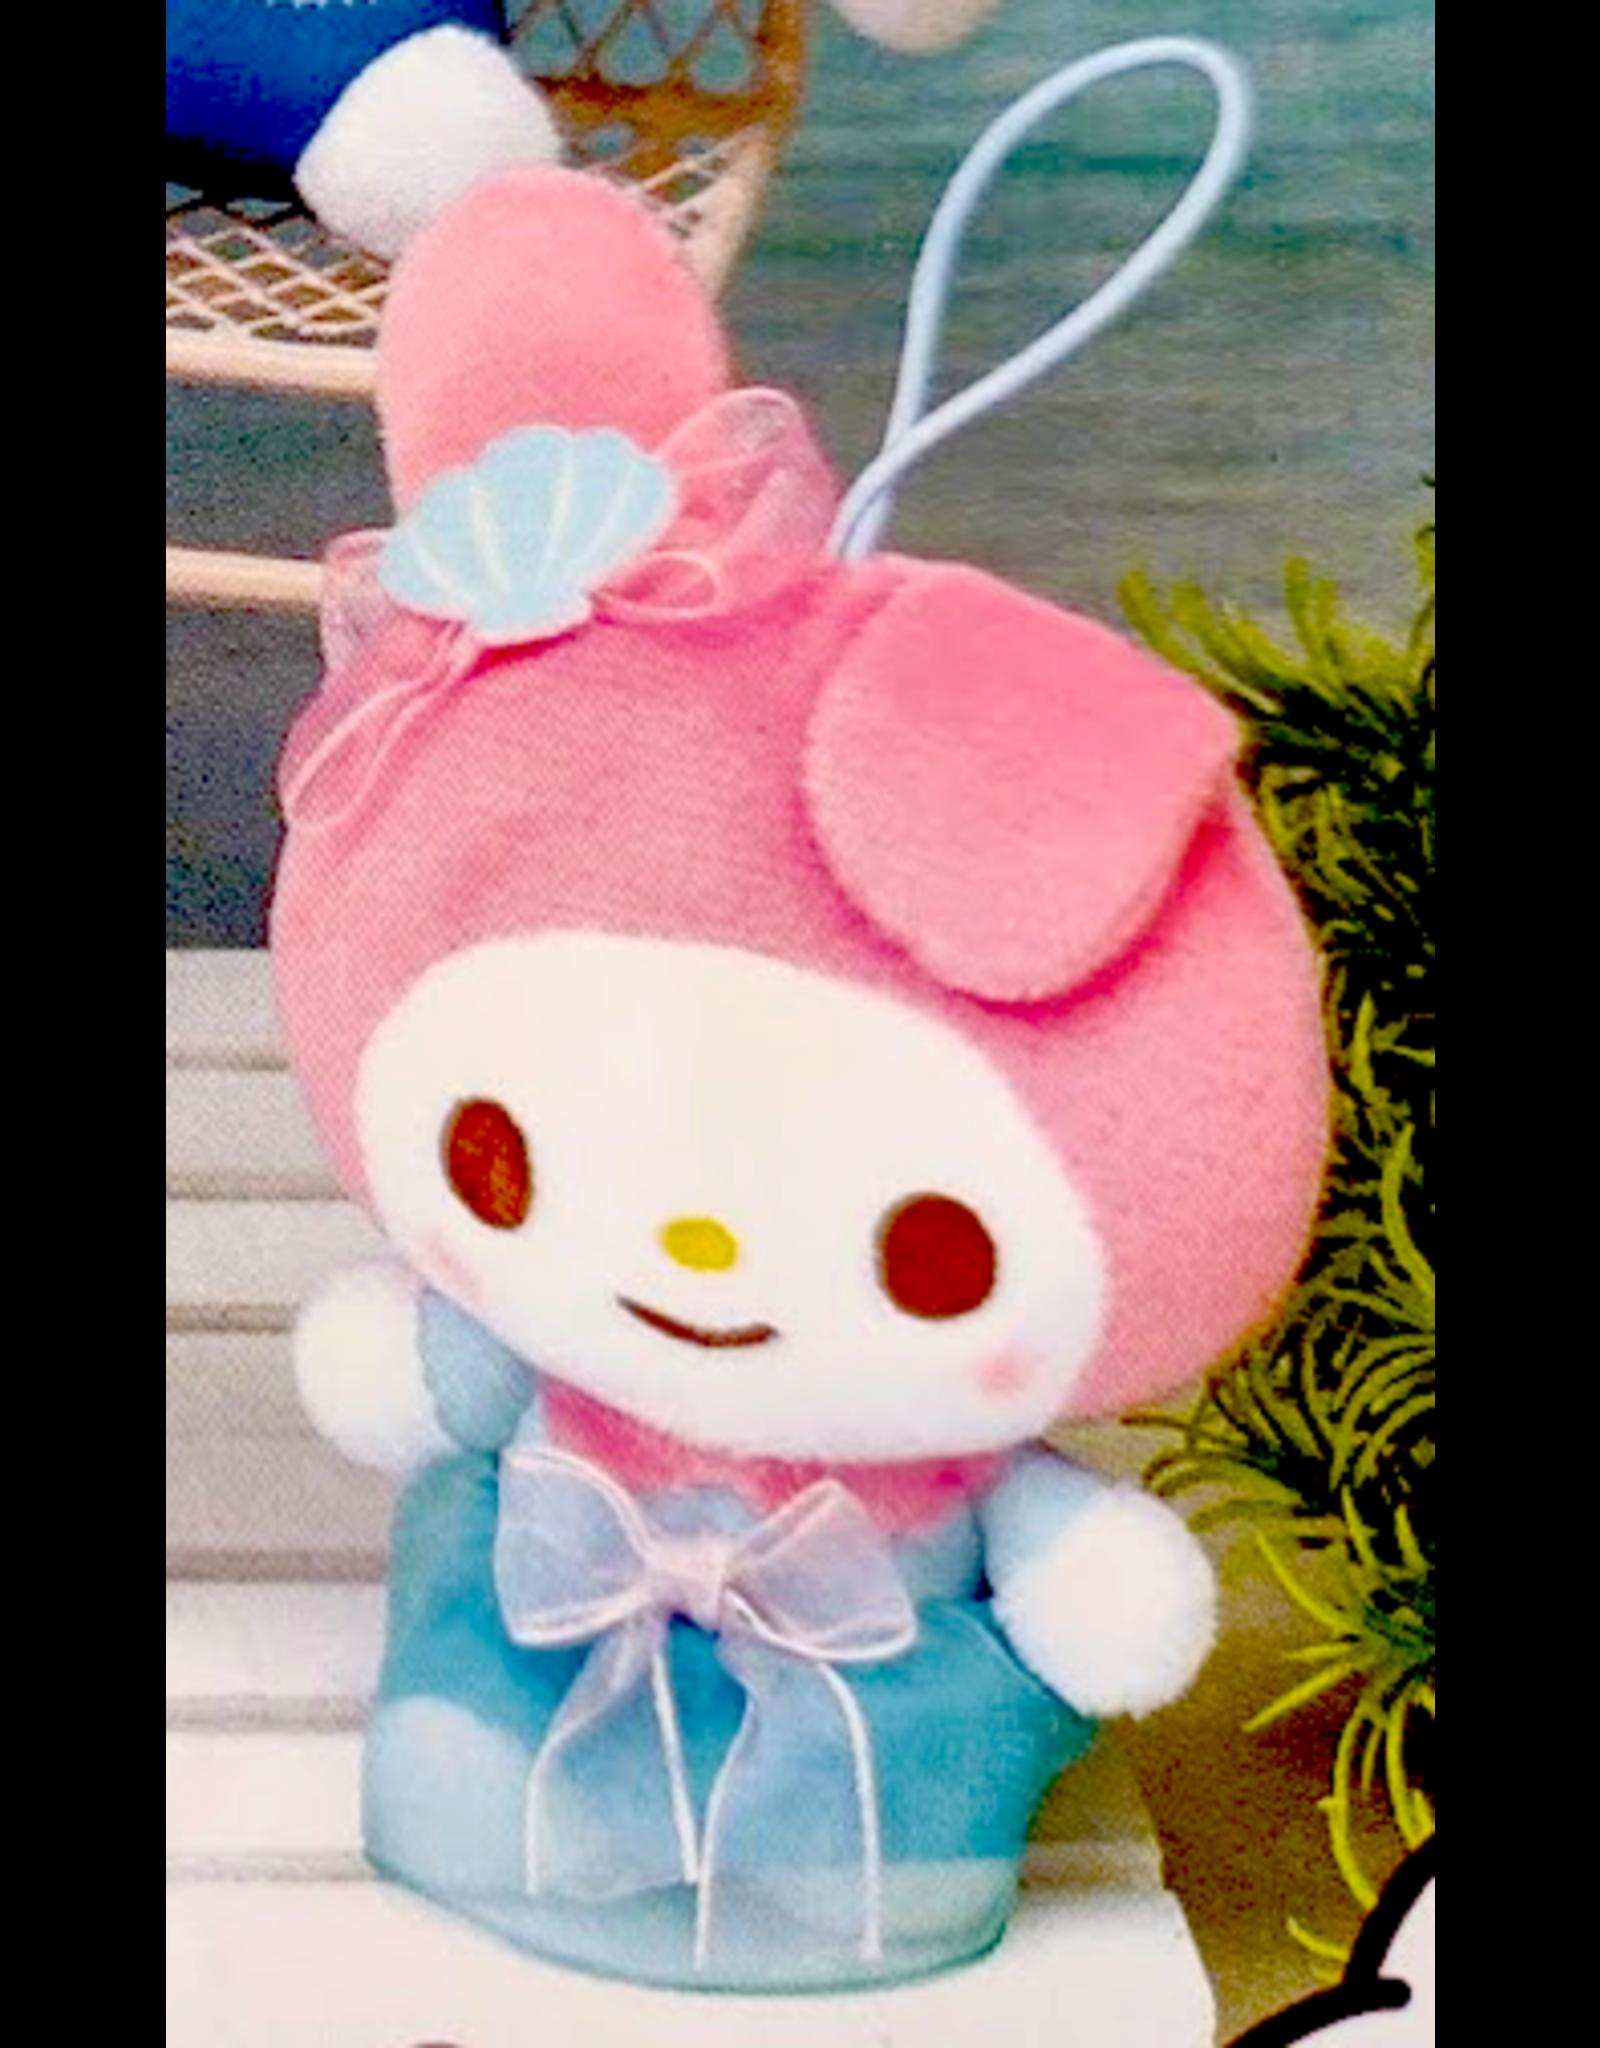 Sanrio Yurukawa Characters Series Mermaid Dress Mascot - My Melody - 10 cm